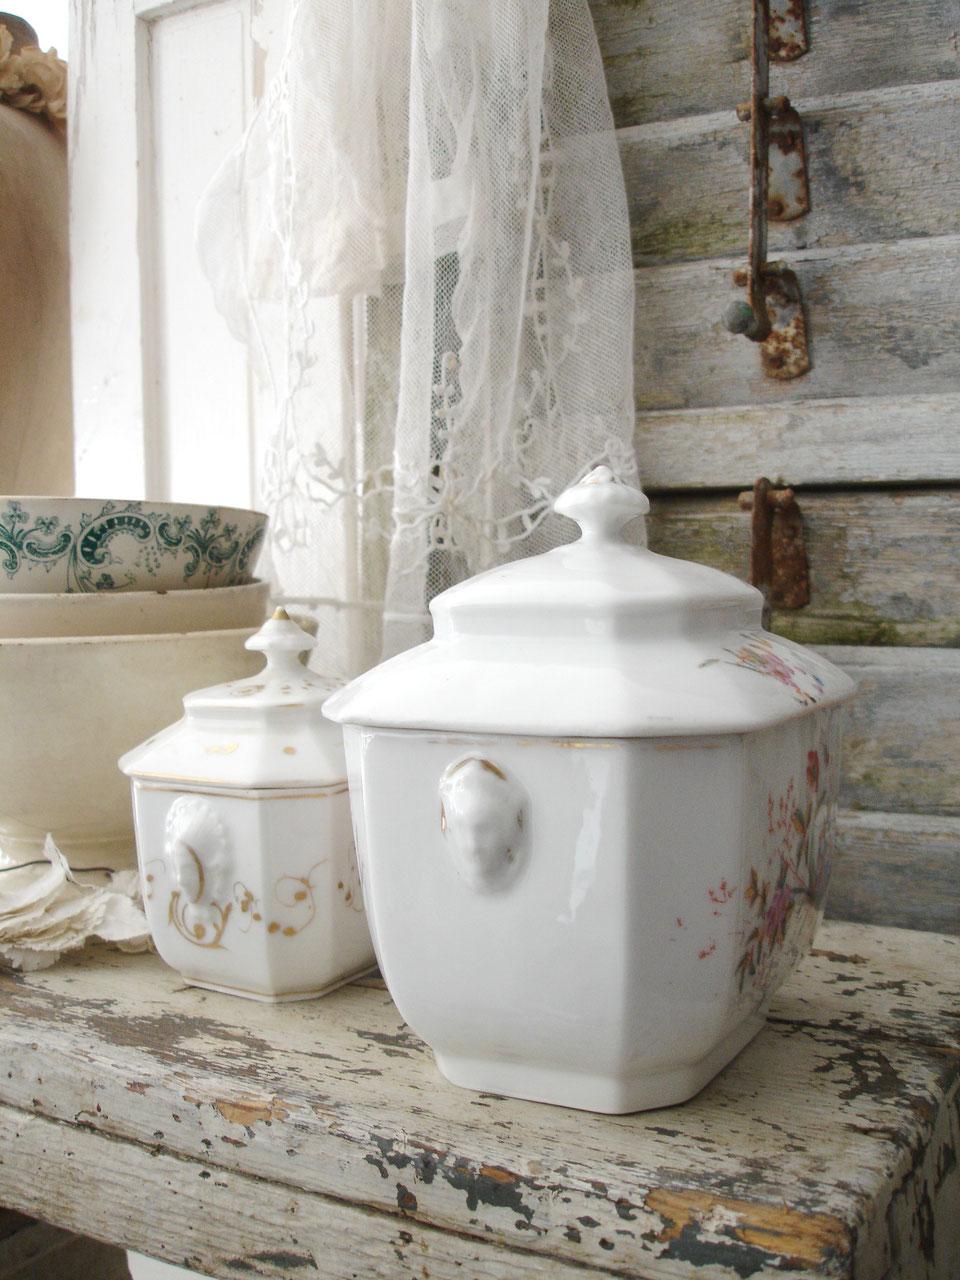 antikes porzellan keramik terrinen aus frankreich. Black Bedroom Furniture Sets. Home Design Ideas